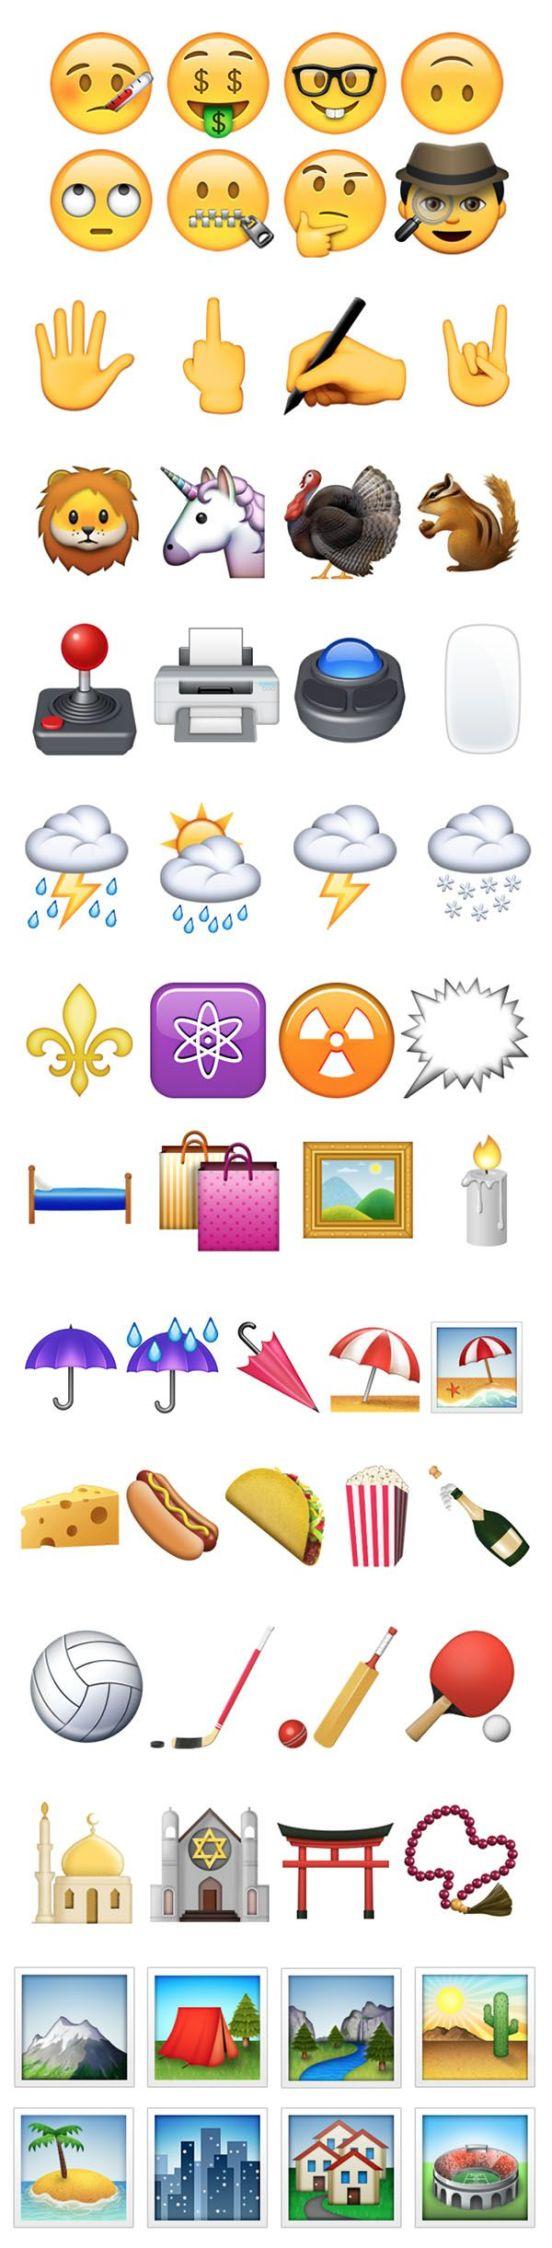 emojis ios 91 whatsapp clipset